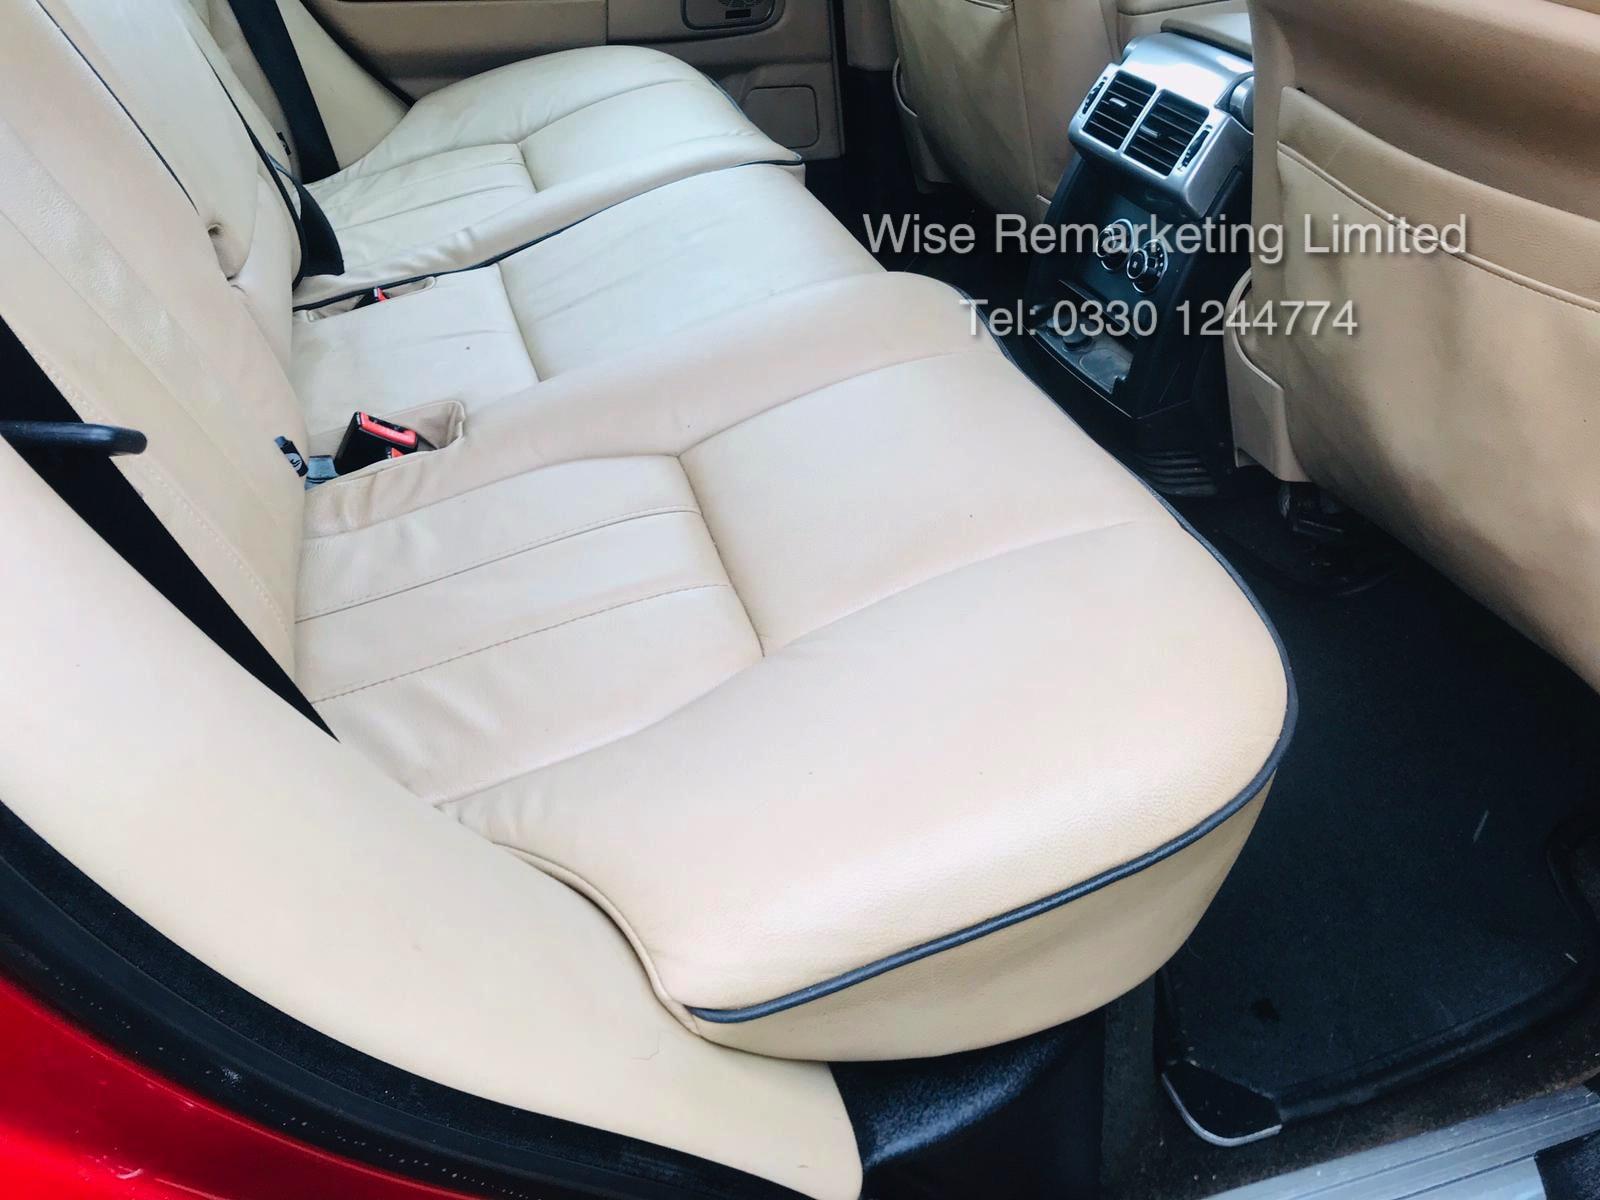 Range Rover Vogue 3.6 TDV8 HSE Auto - 2010 Model - Cream Leather - Service History - - Image 12 of 28